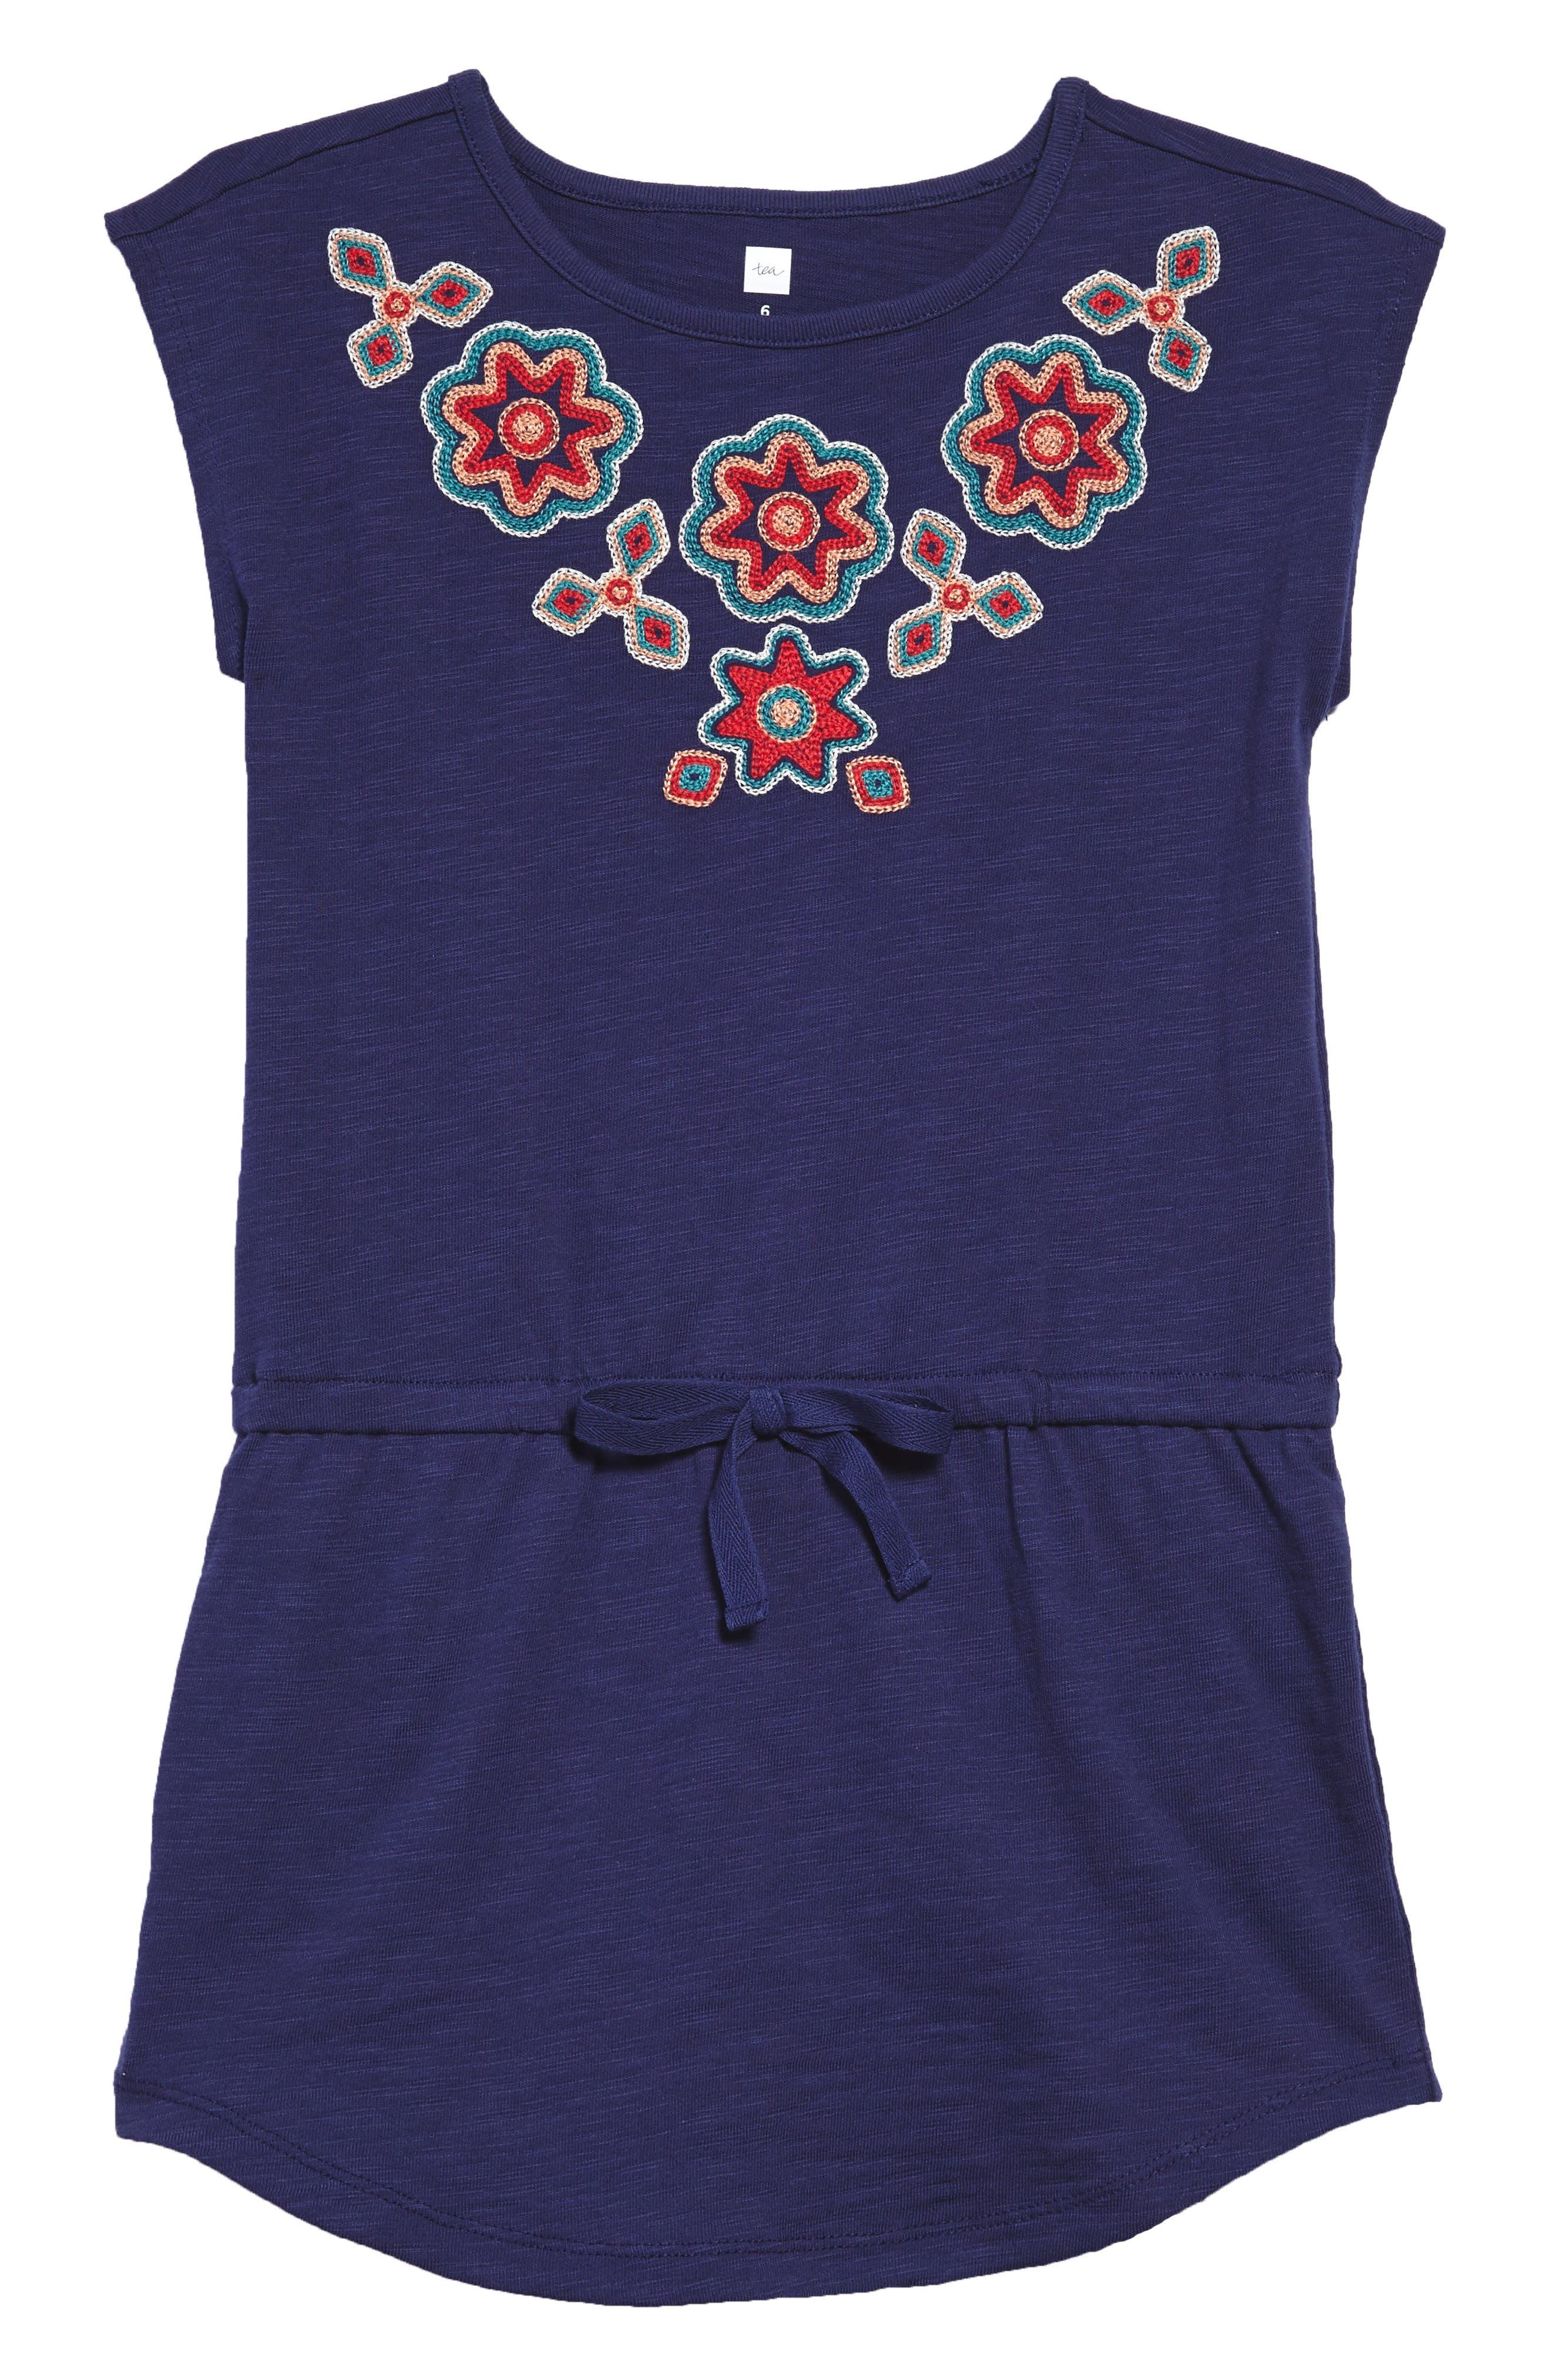 Tea Collection Berry Embroidered Dress (Toddler Girls, Little Girls & Big Girls)